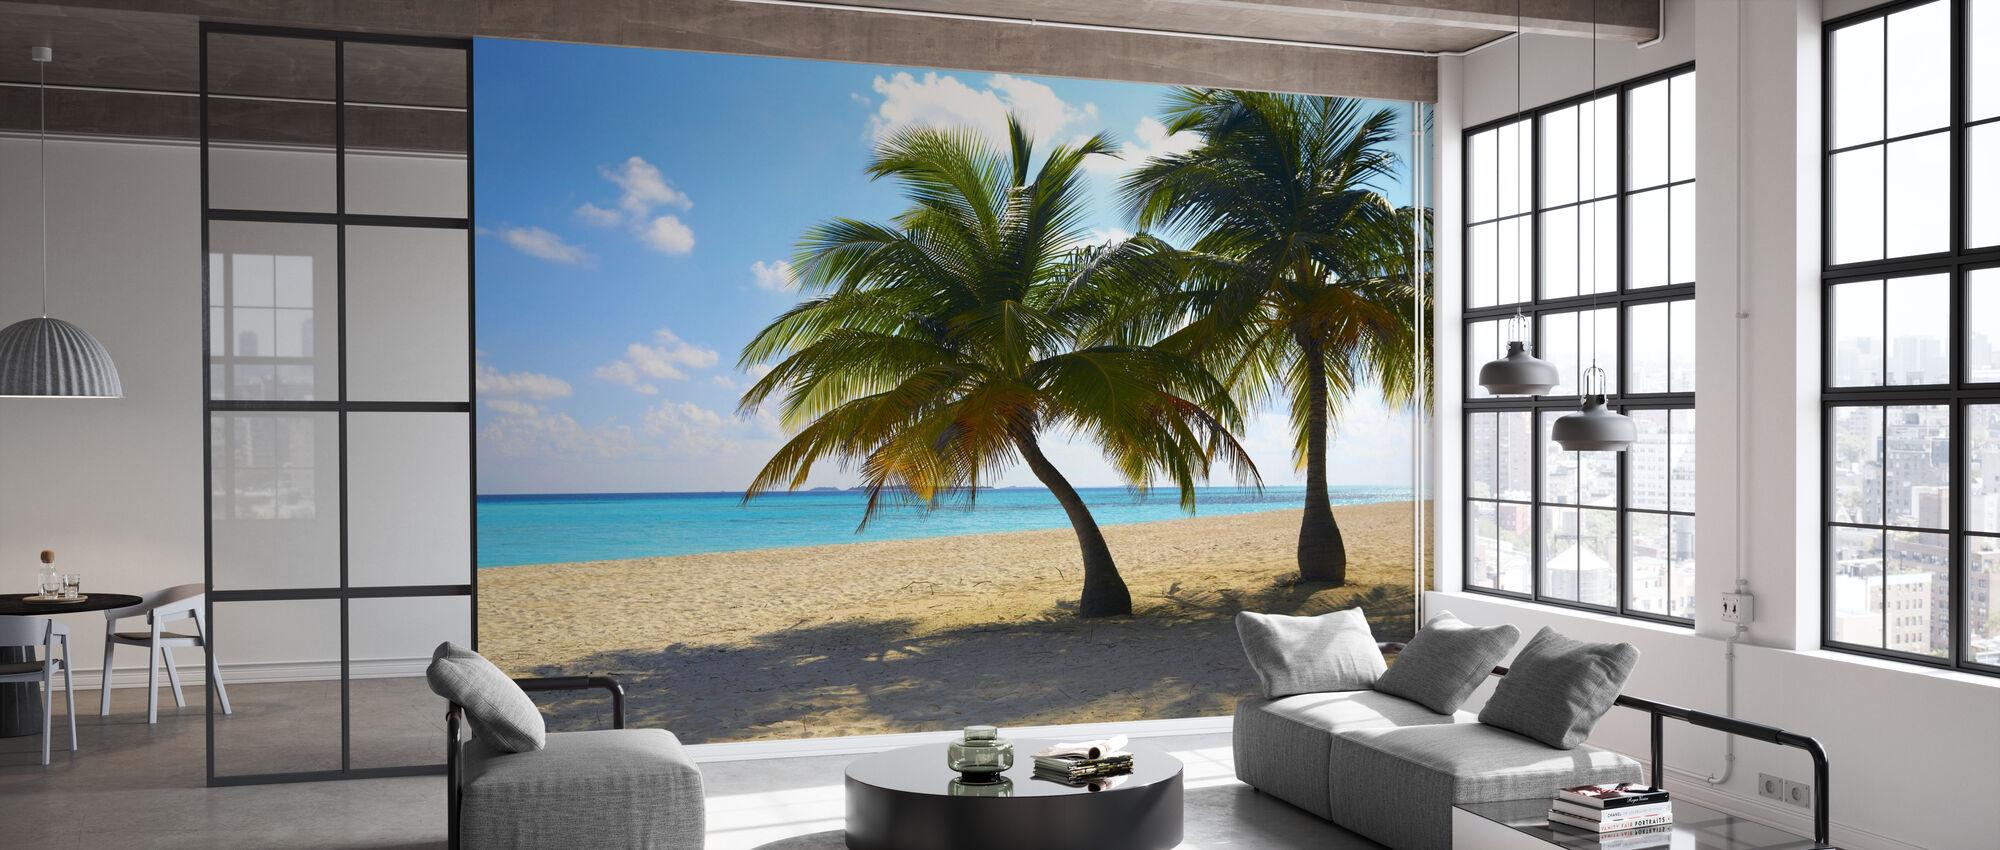 Maldives - Behang - Kantoor